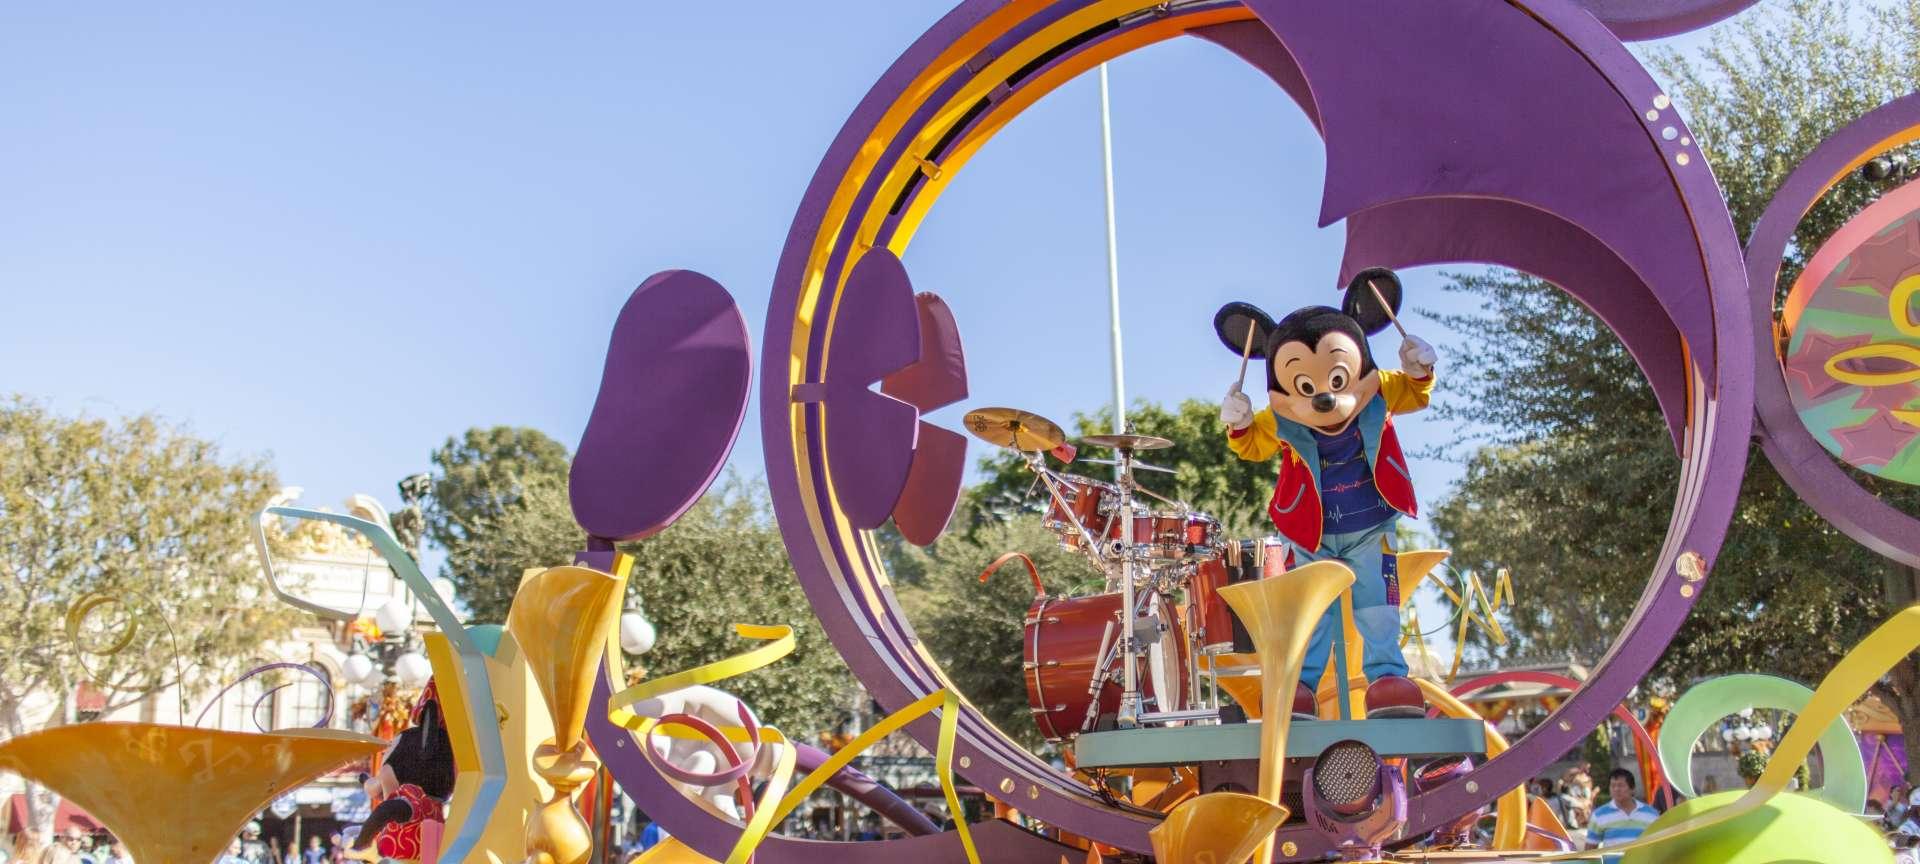 Disneyland and Nearby Theme Parks   Huntington Beach CA on